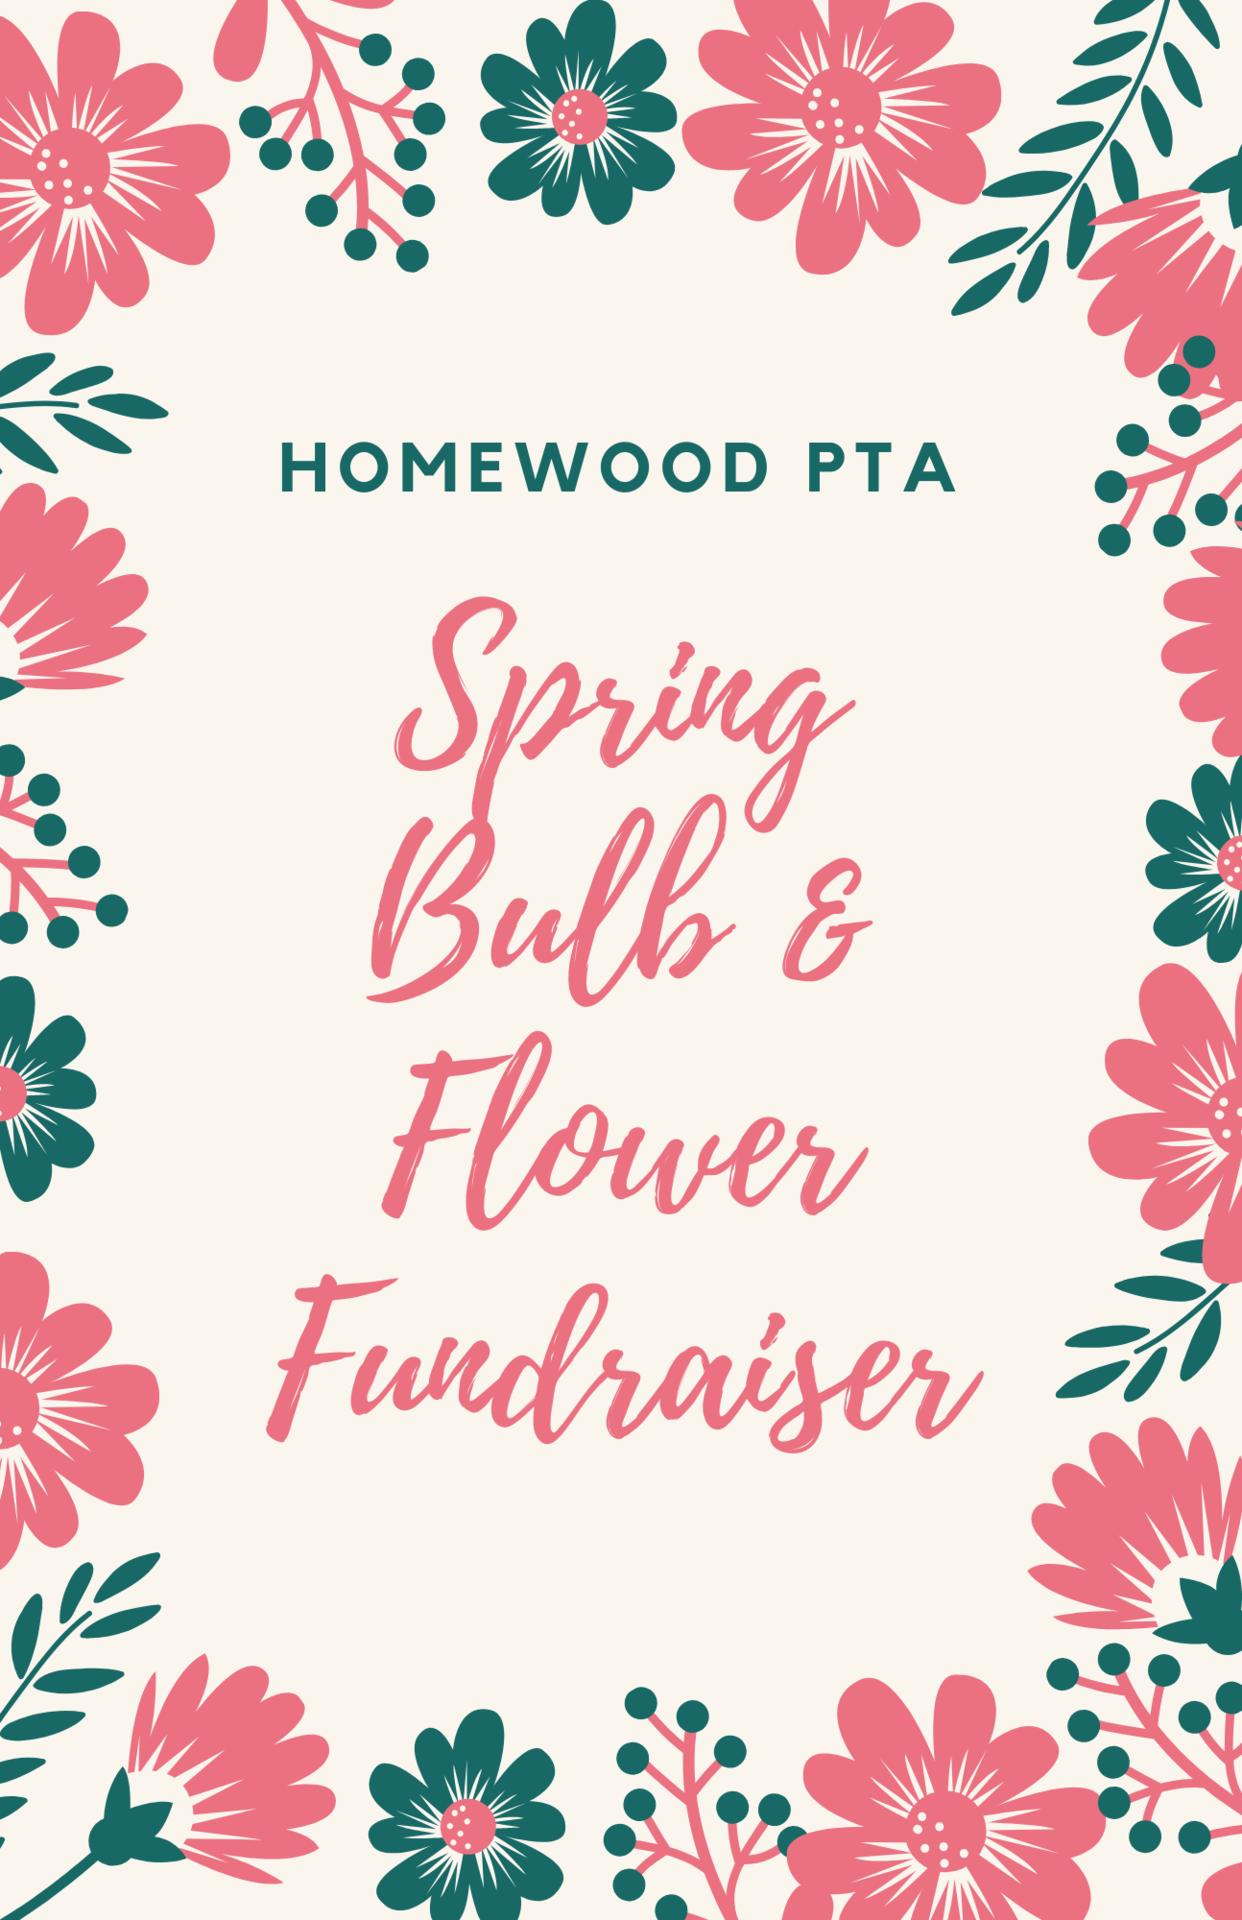 Homewood PTA spring fundraiser